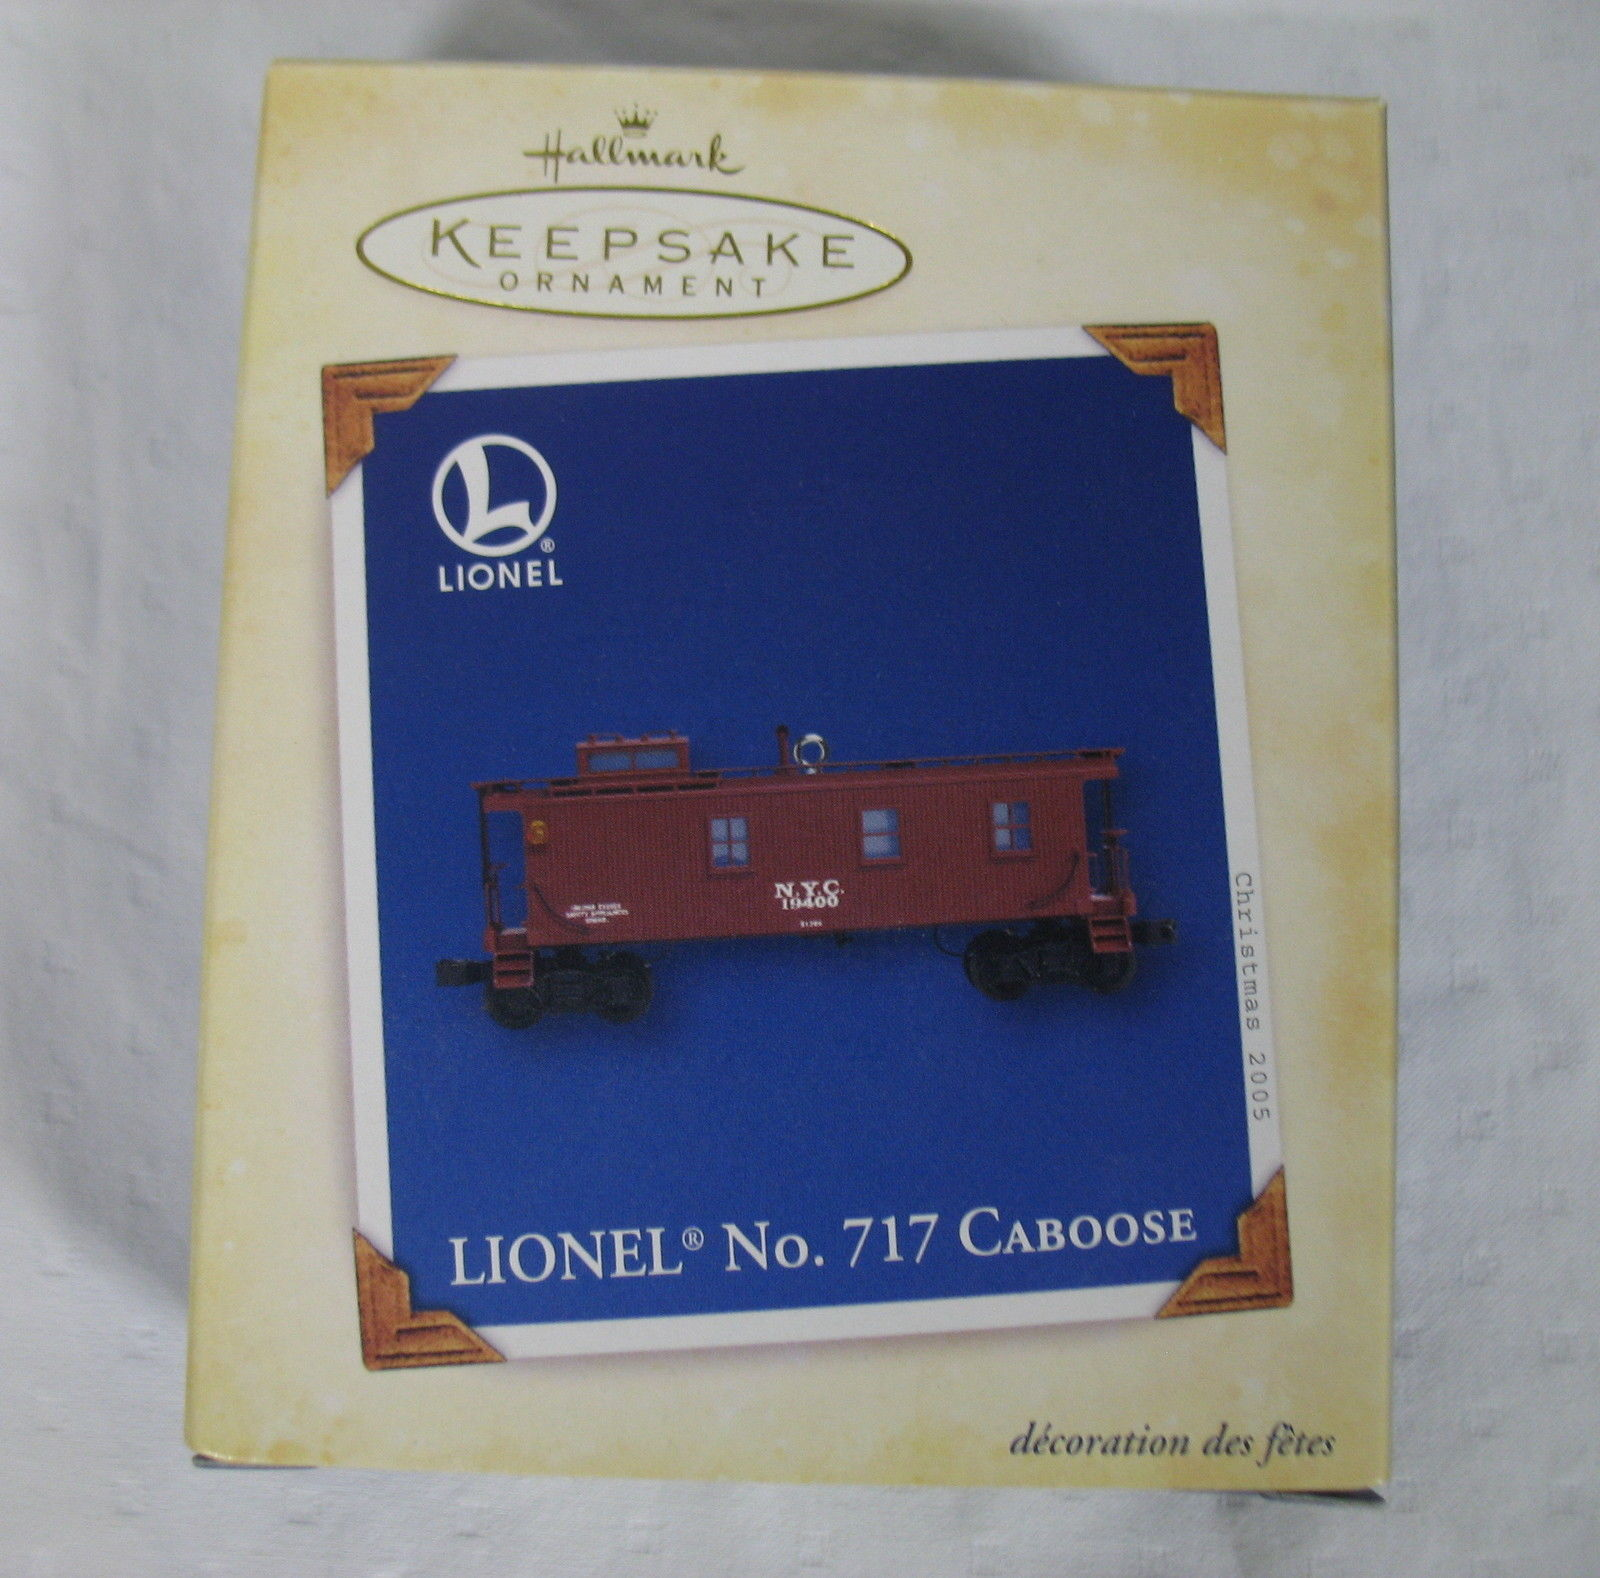 Hallmark Ornament Lionel No. 717 Caboose Mint 2005 New in Box Keepsake Metal